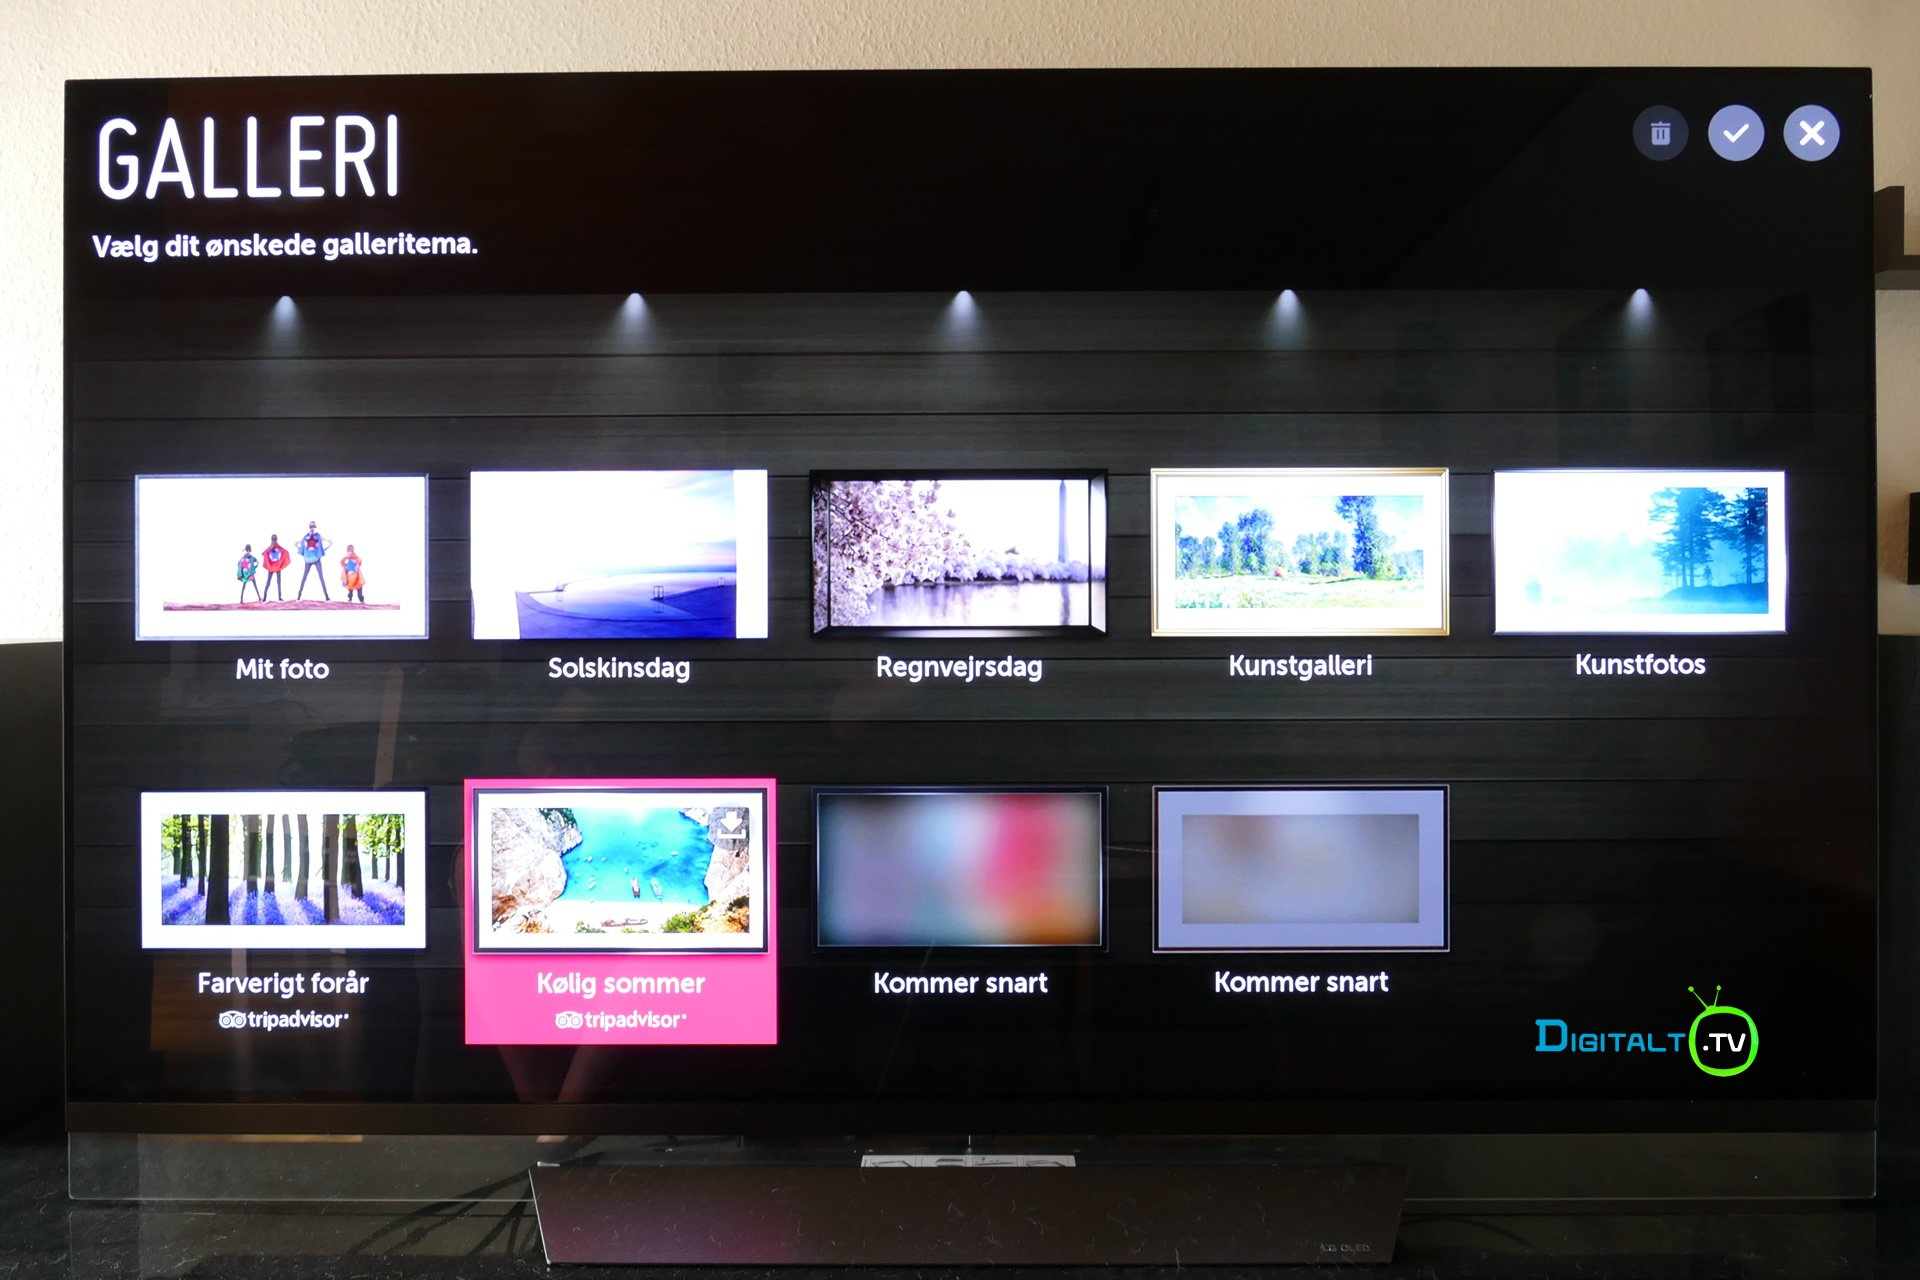 LG E8 OLED galleri menu